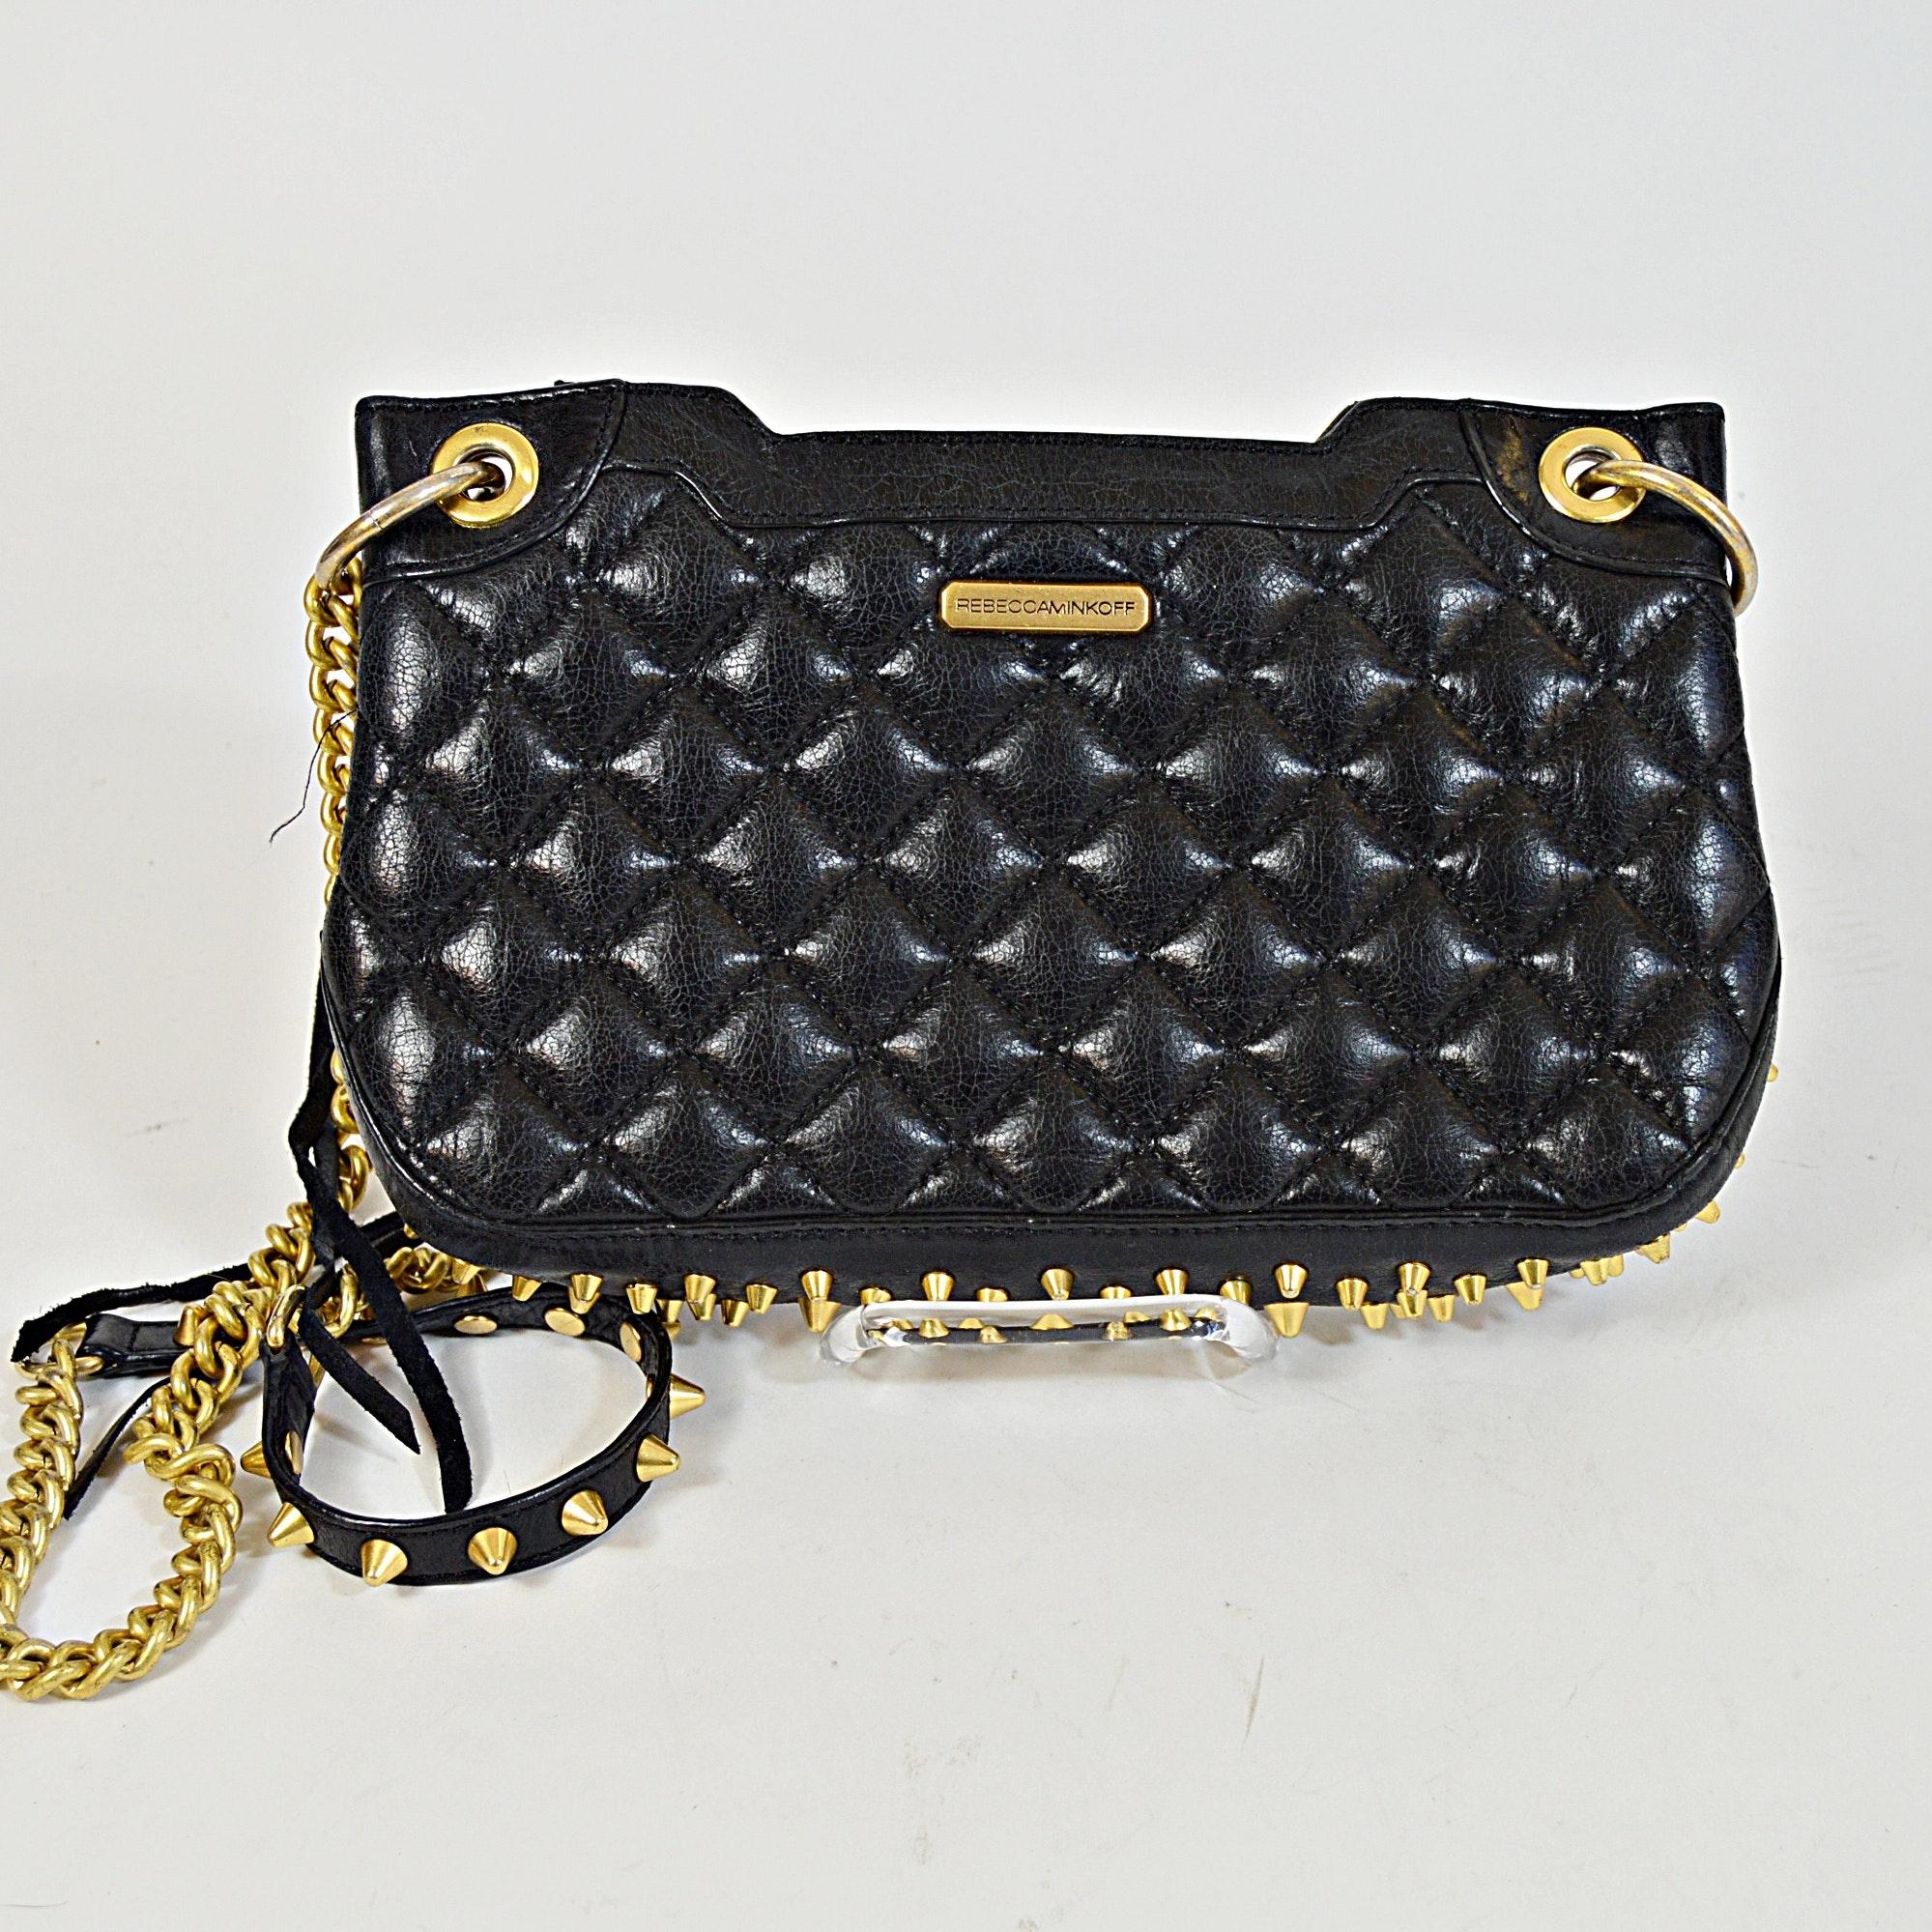 Rebecca Minkoff Quilted Black Leather Handbag